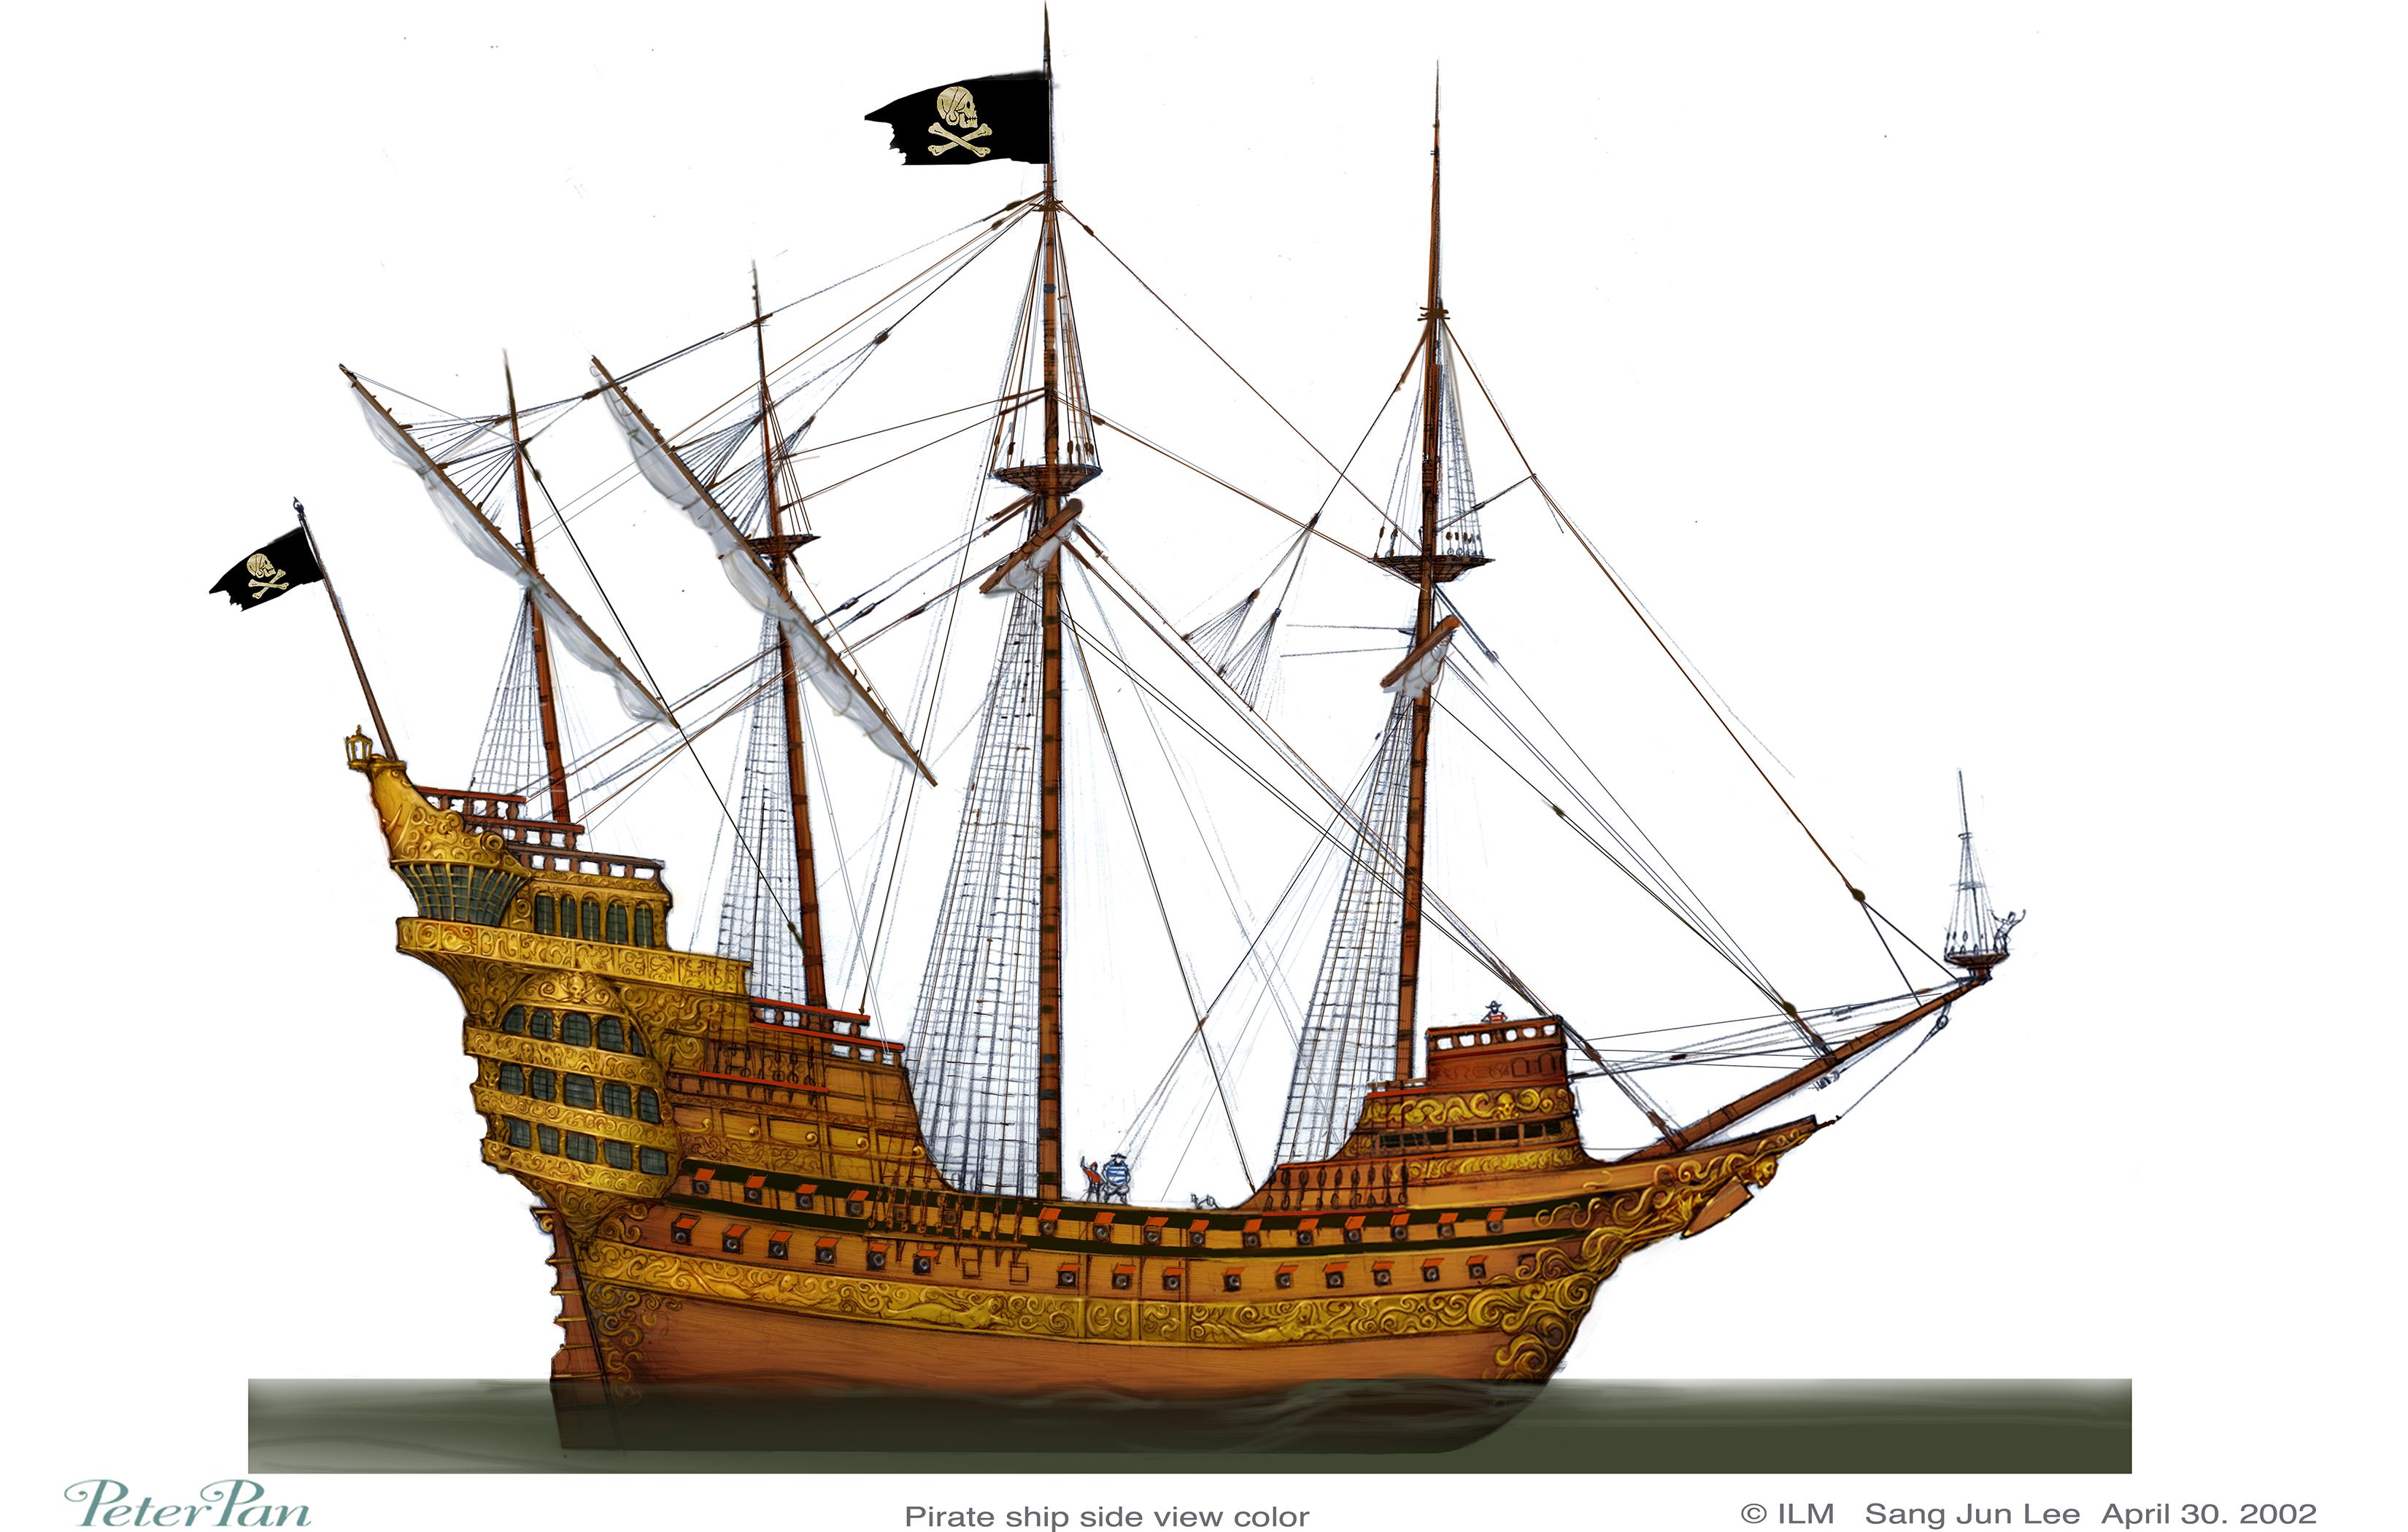 pirateship_side_color